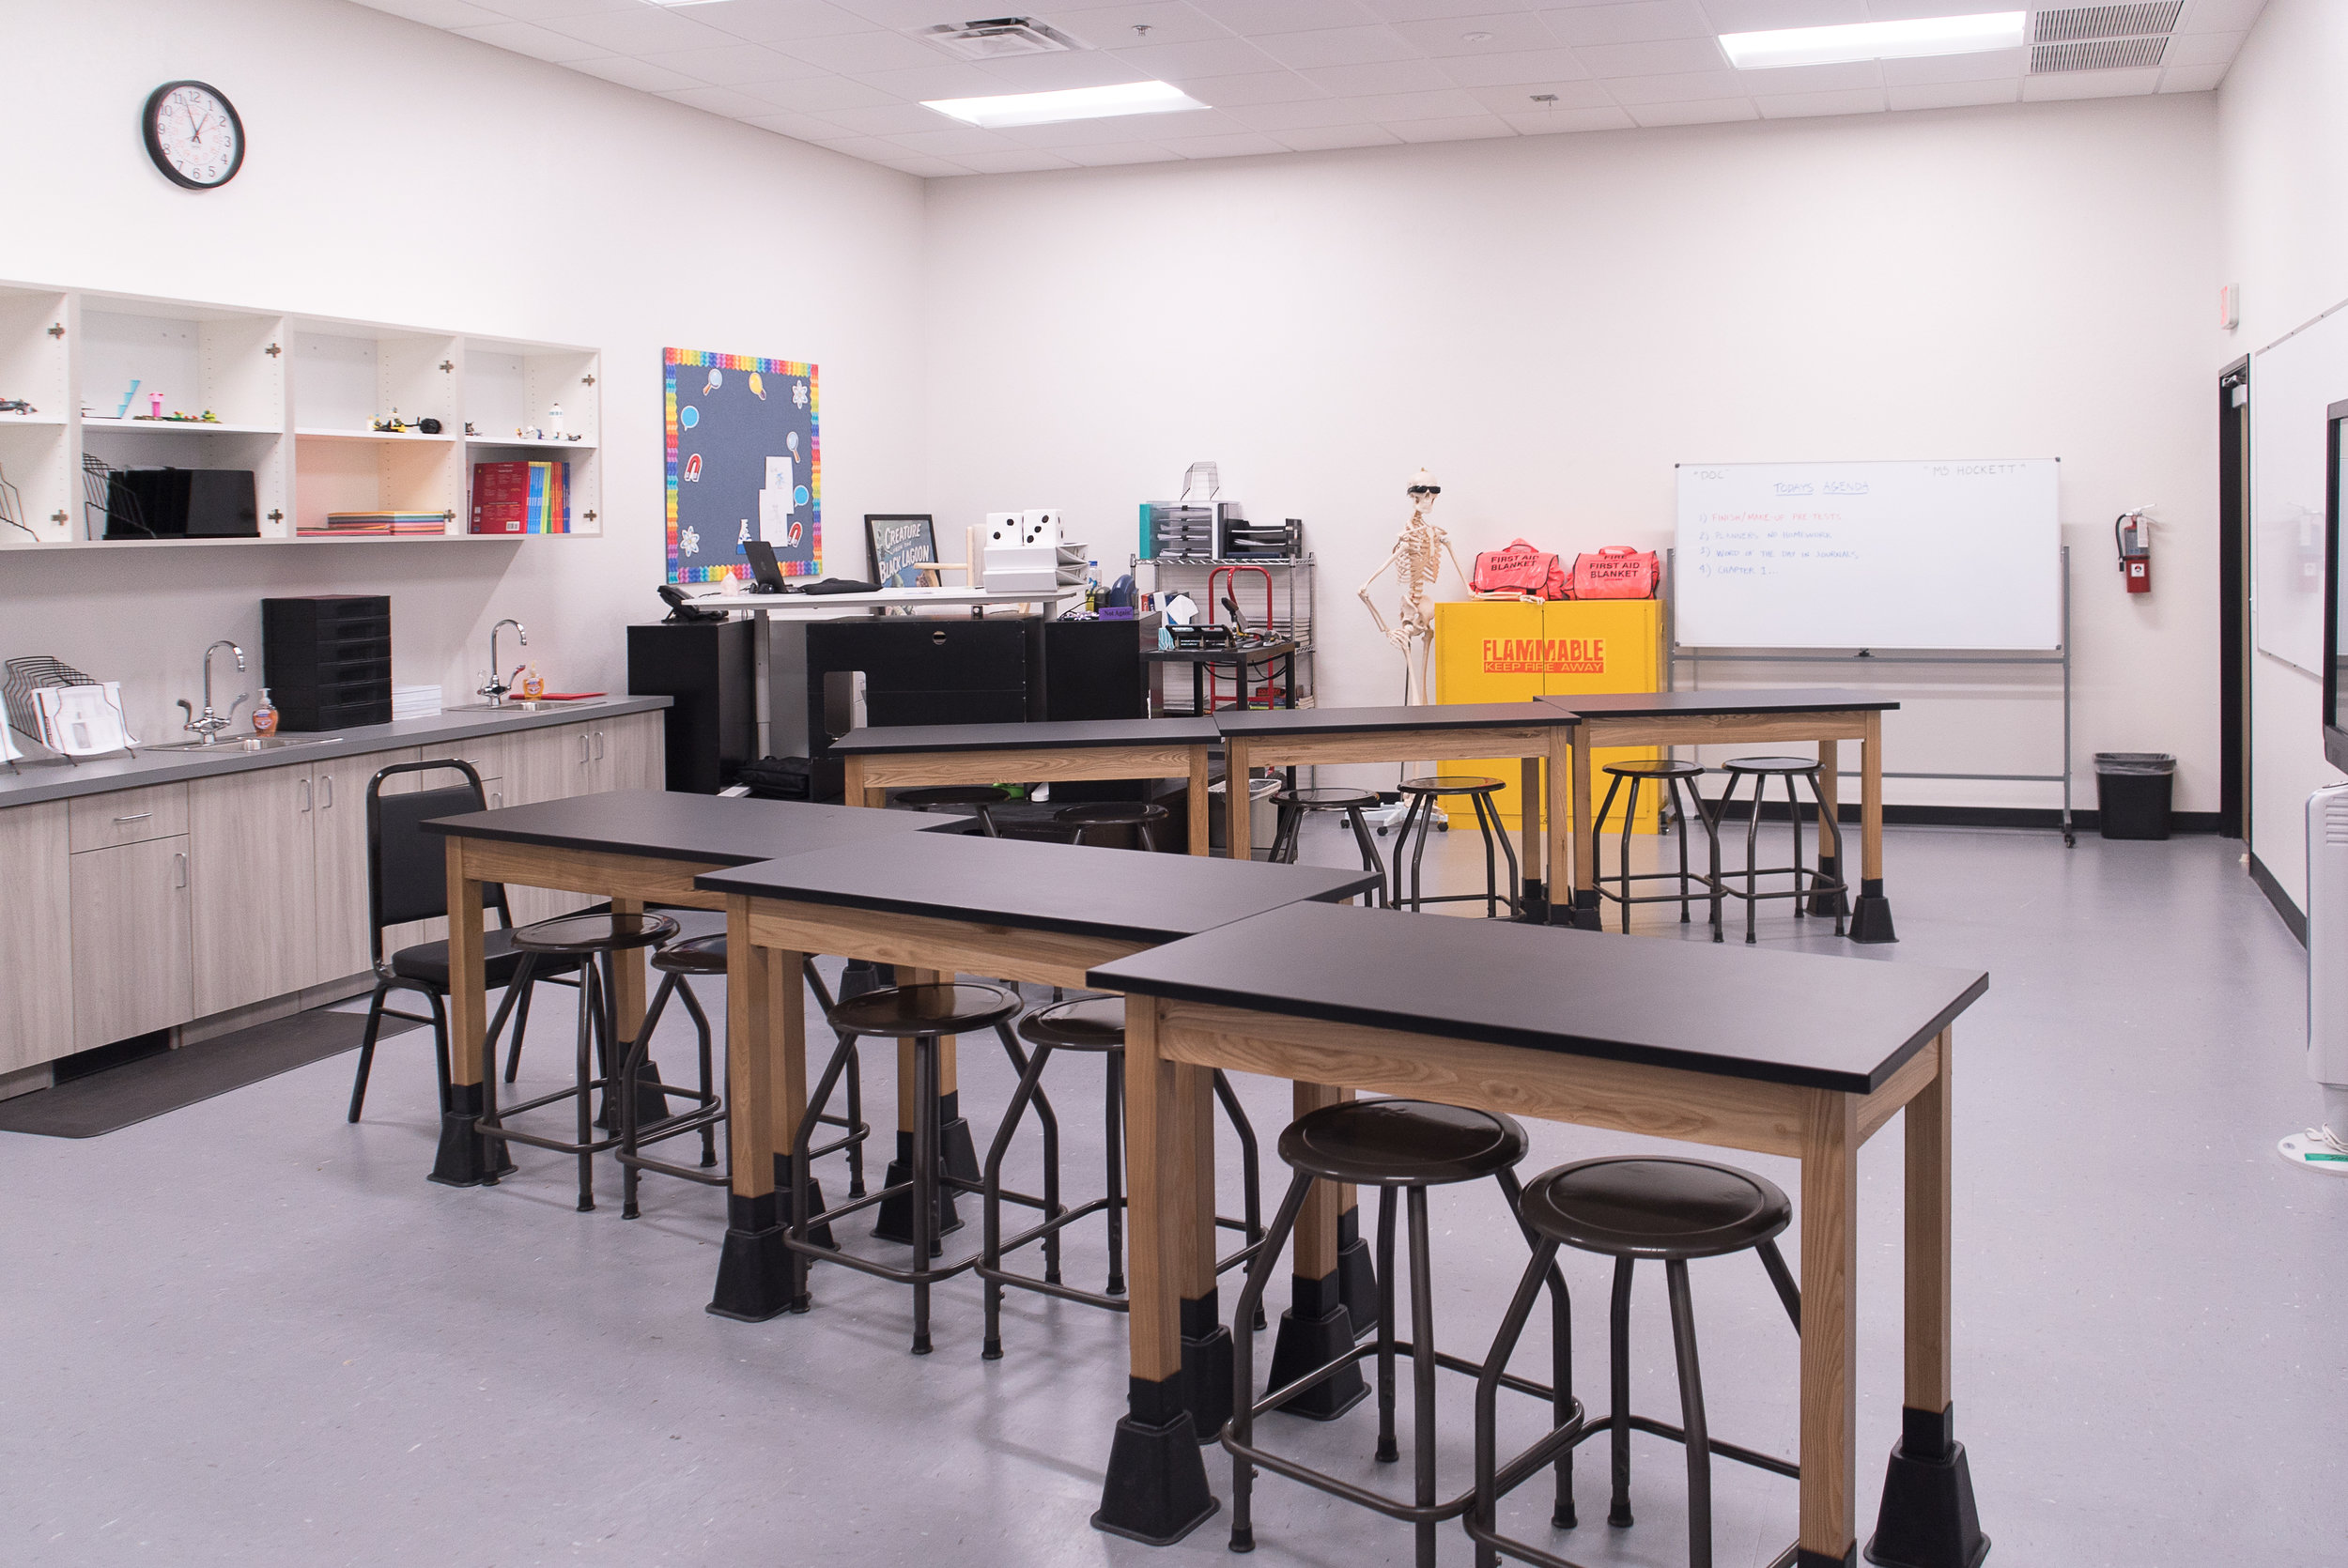 ps-academy-new-classrooms.jpg